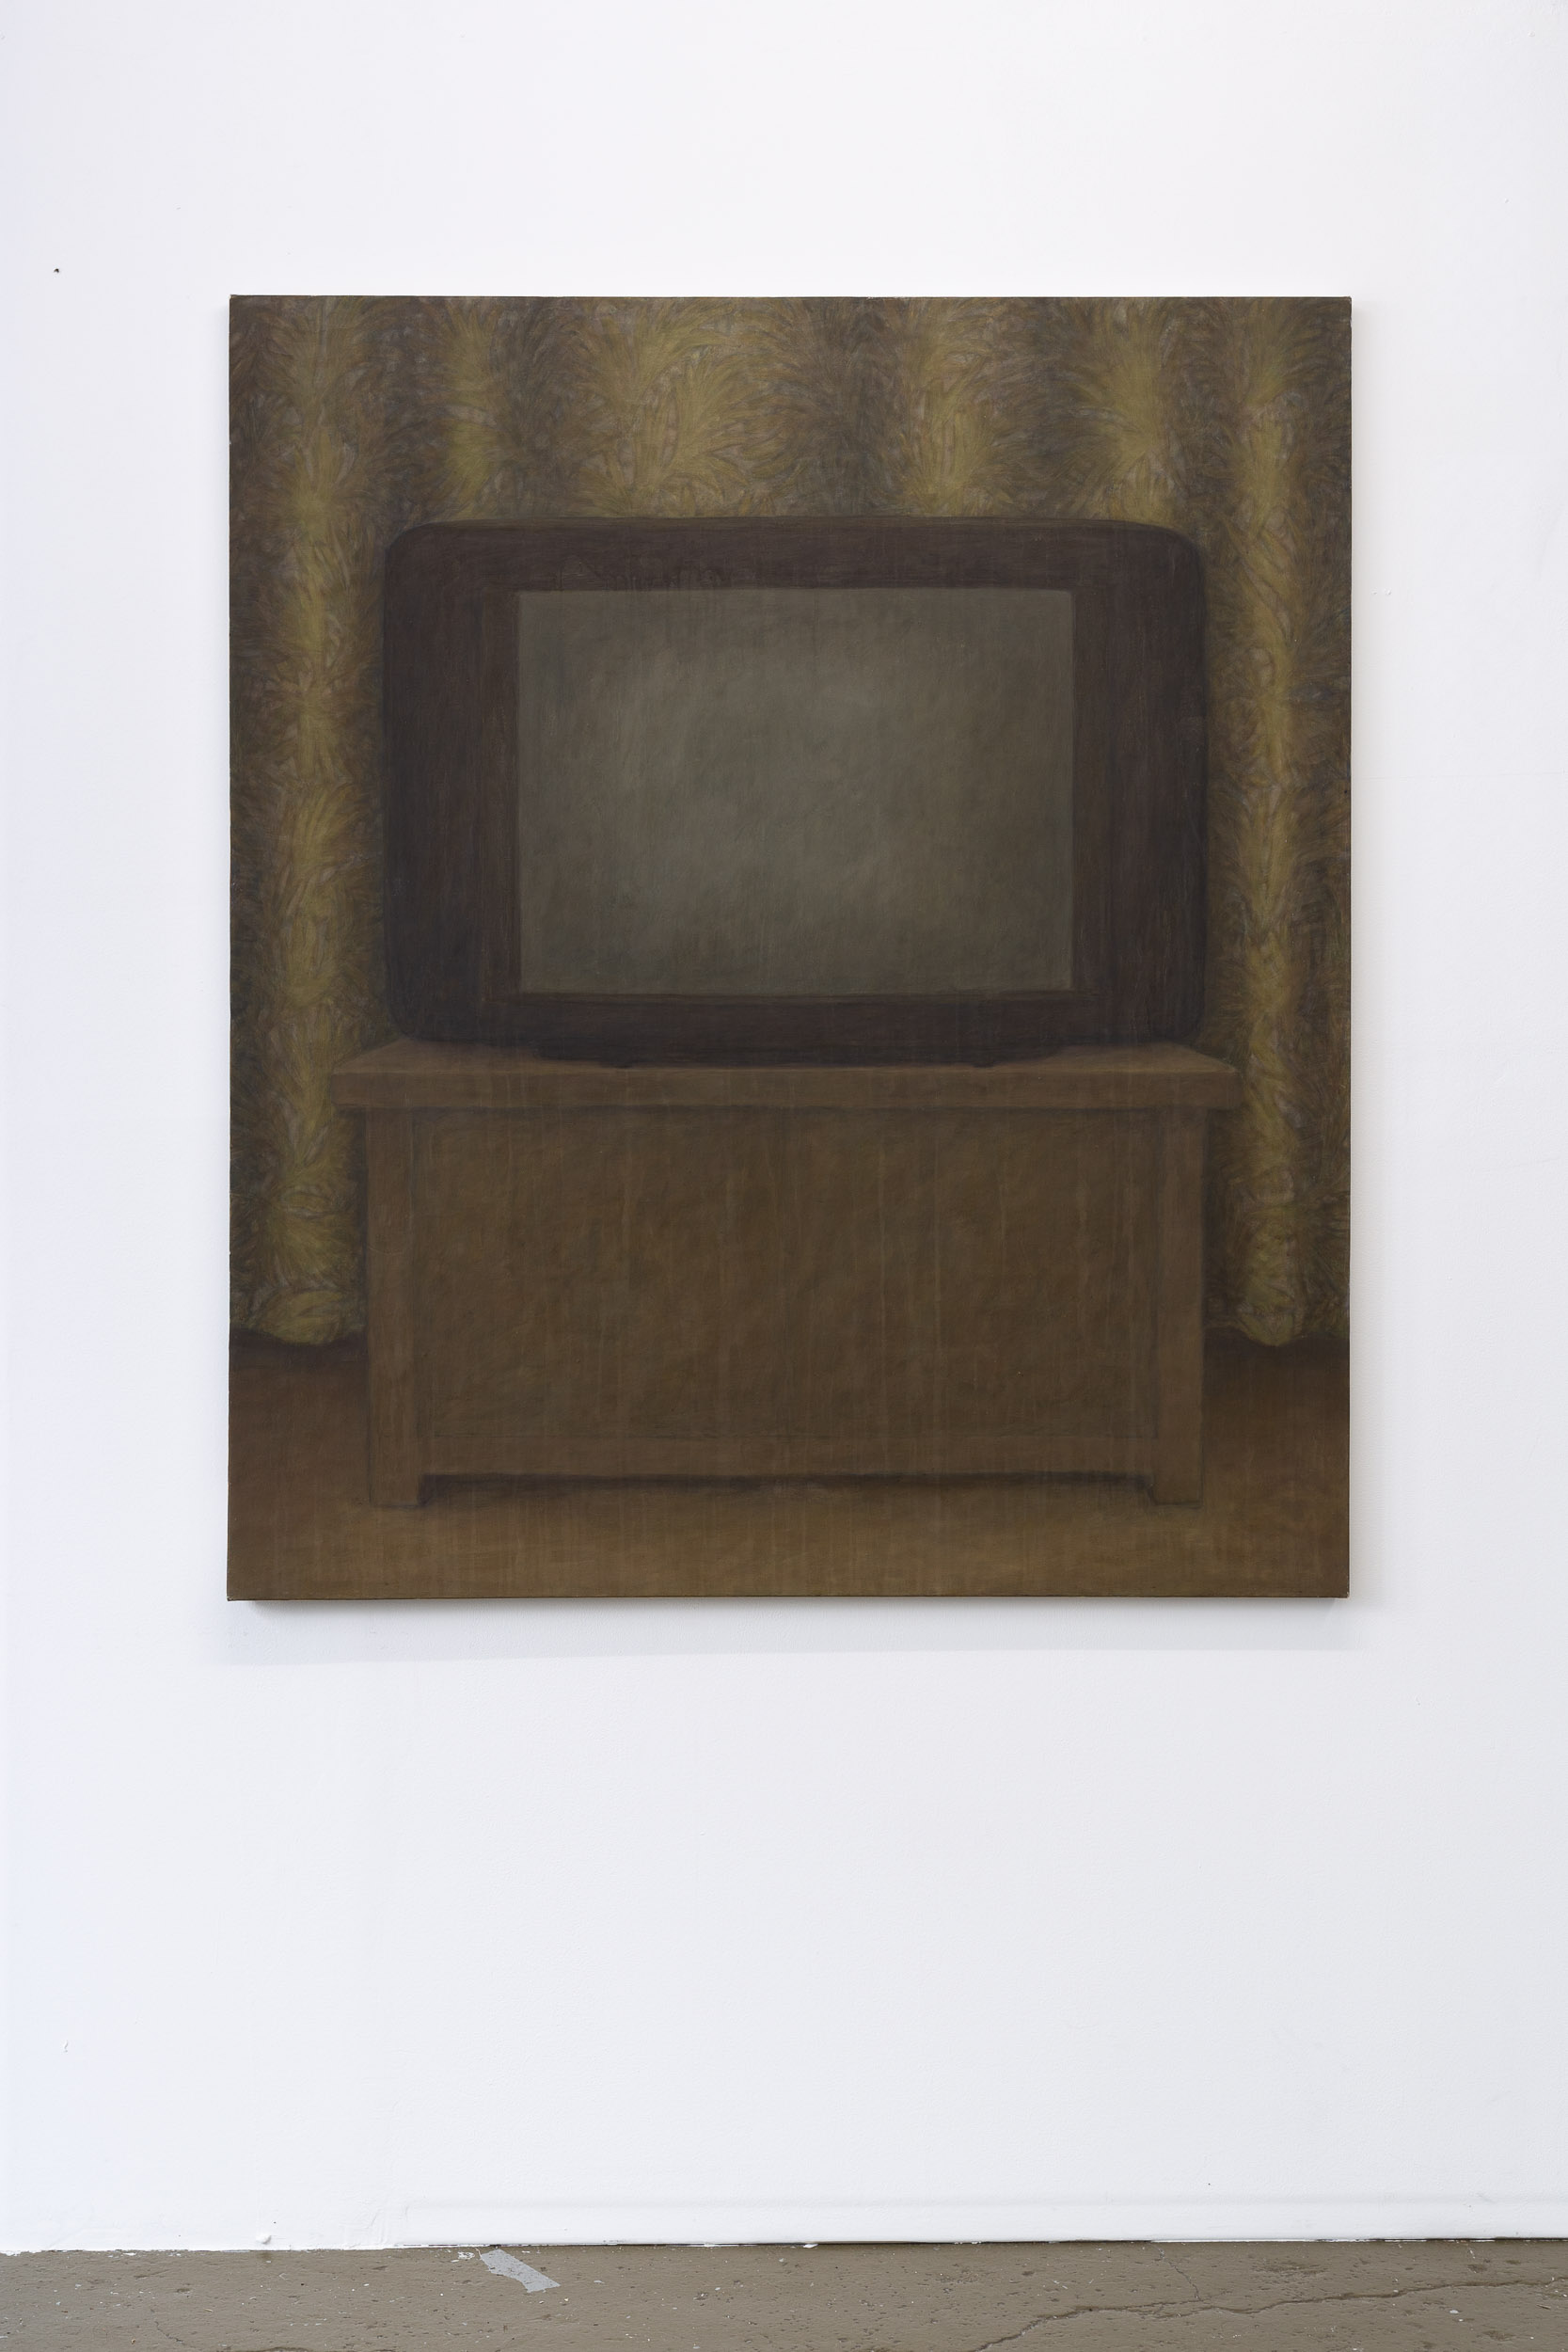 Christoph Hänsli,  Untitled , 1995, egg tempera and acrylic on canvas, 139 x 120 cm  Photo: Kilian Bannwart